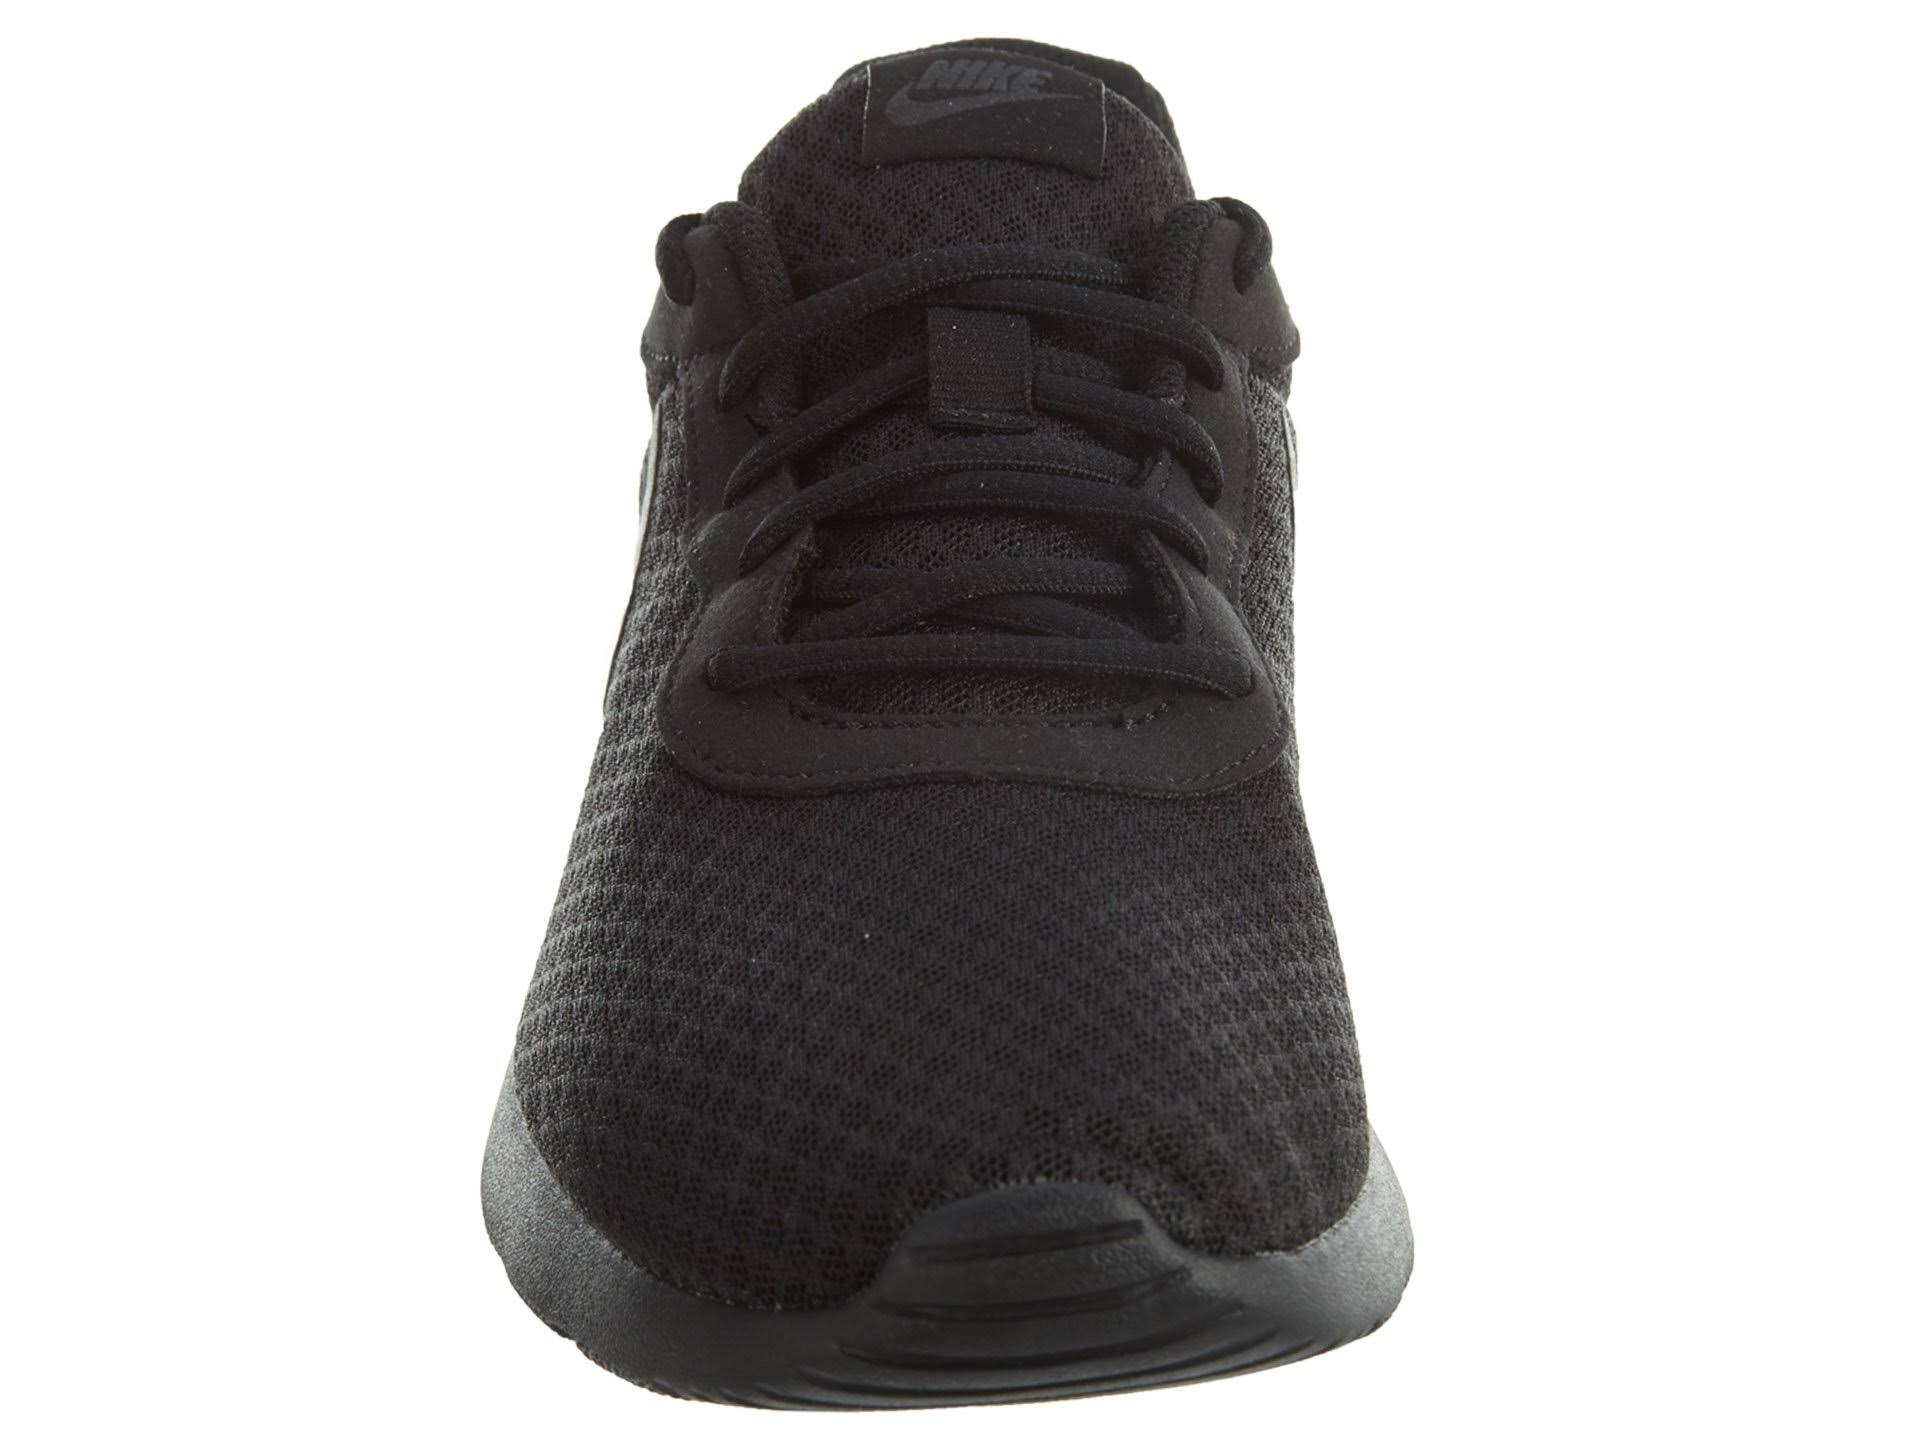 Black anthracite Sneakers Size Casual Nike 9 Mens Tanjun black 812654 C0UqA